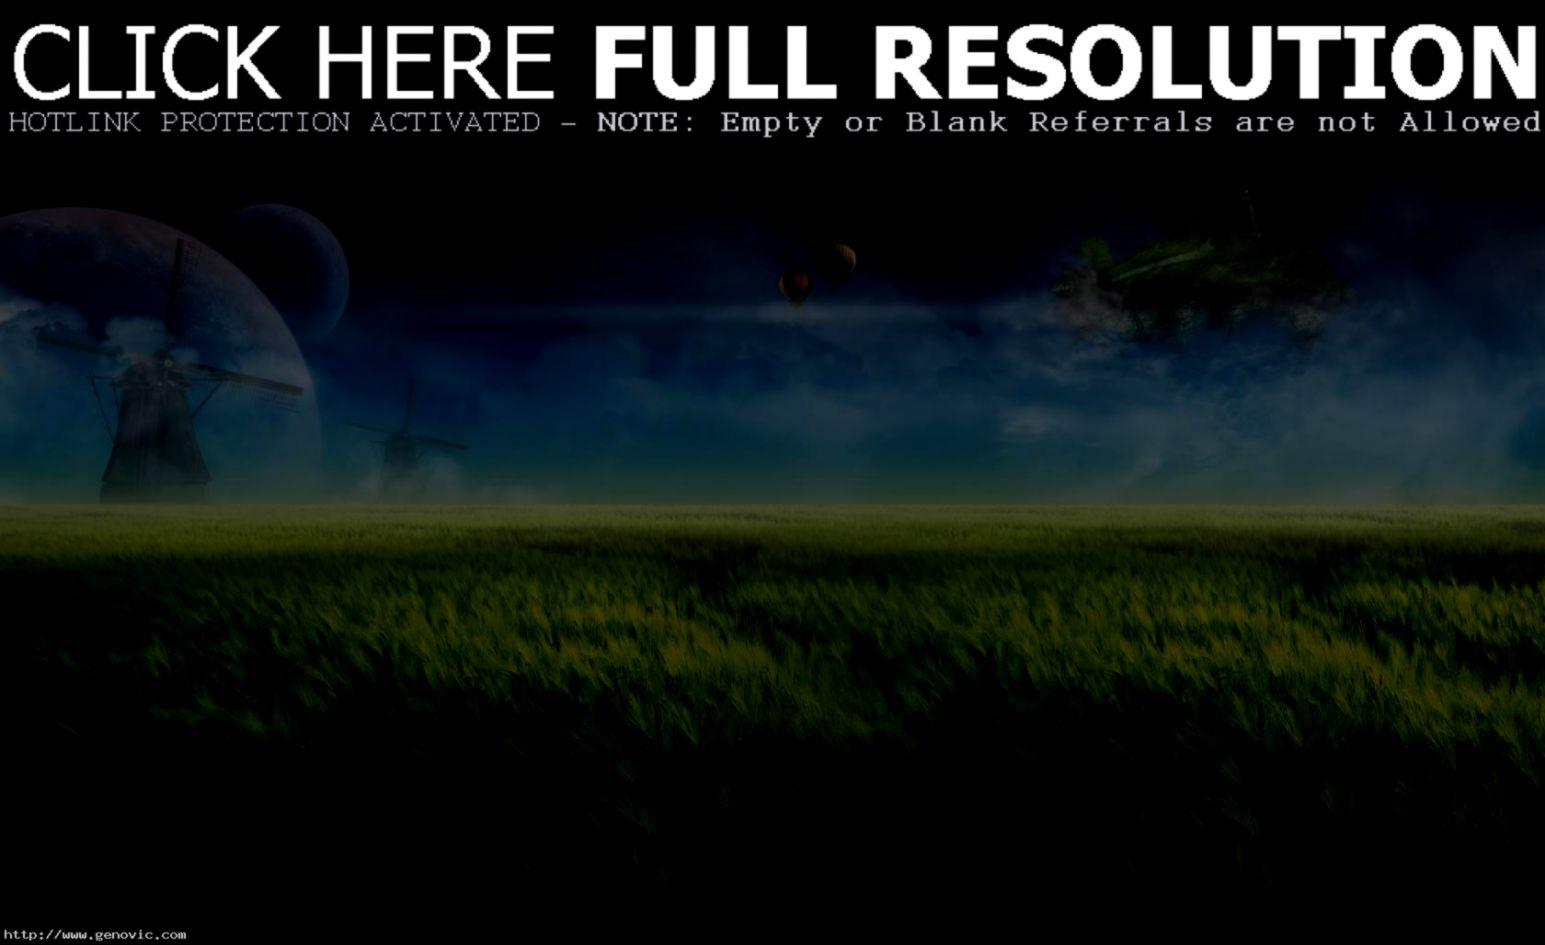 Windows 7 HD Desktop Wallpaper Background